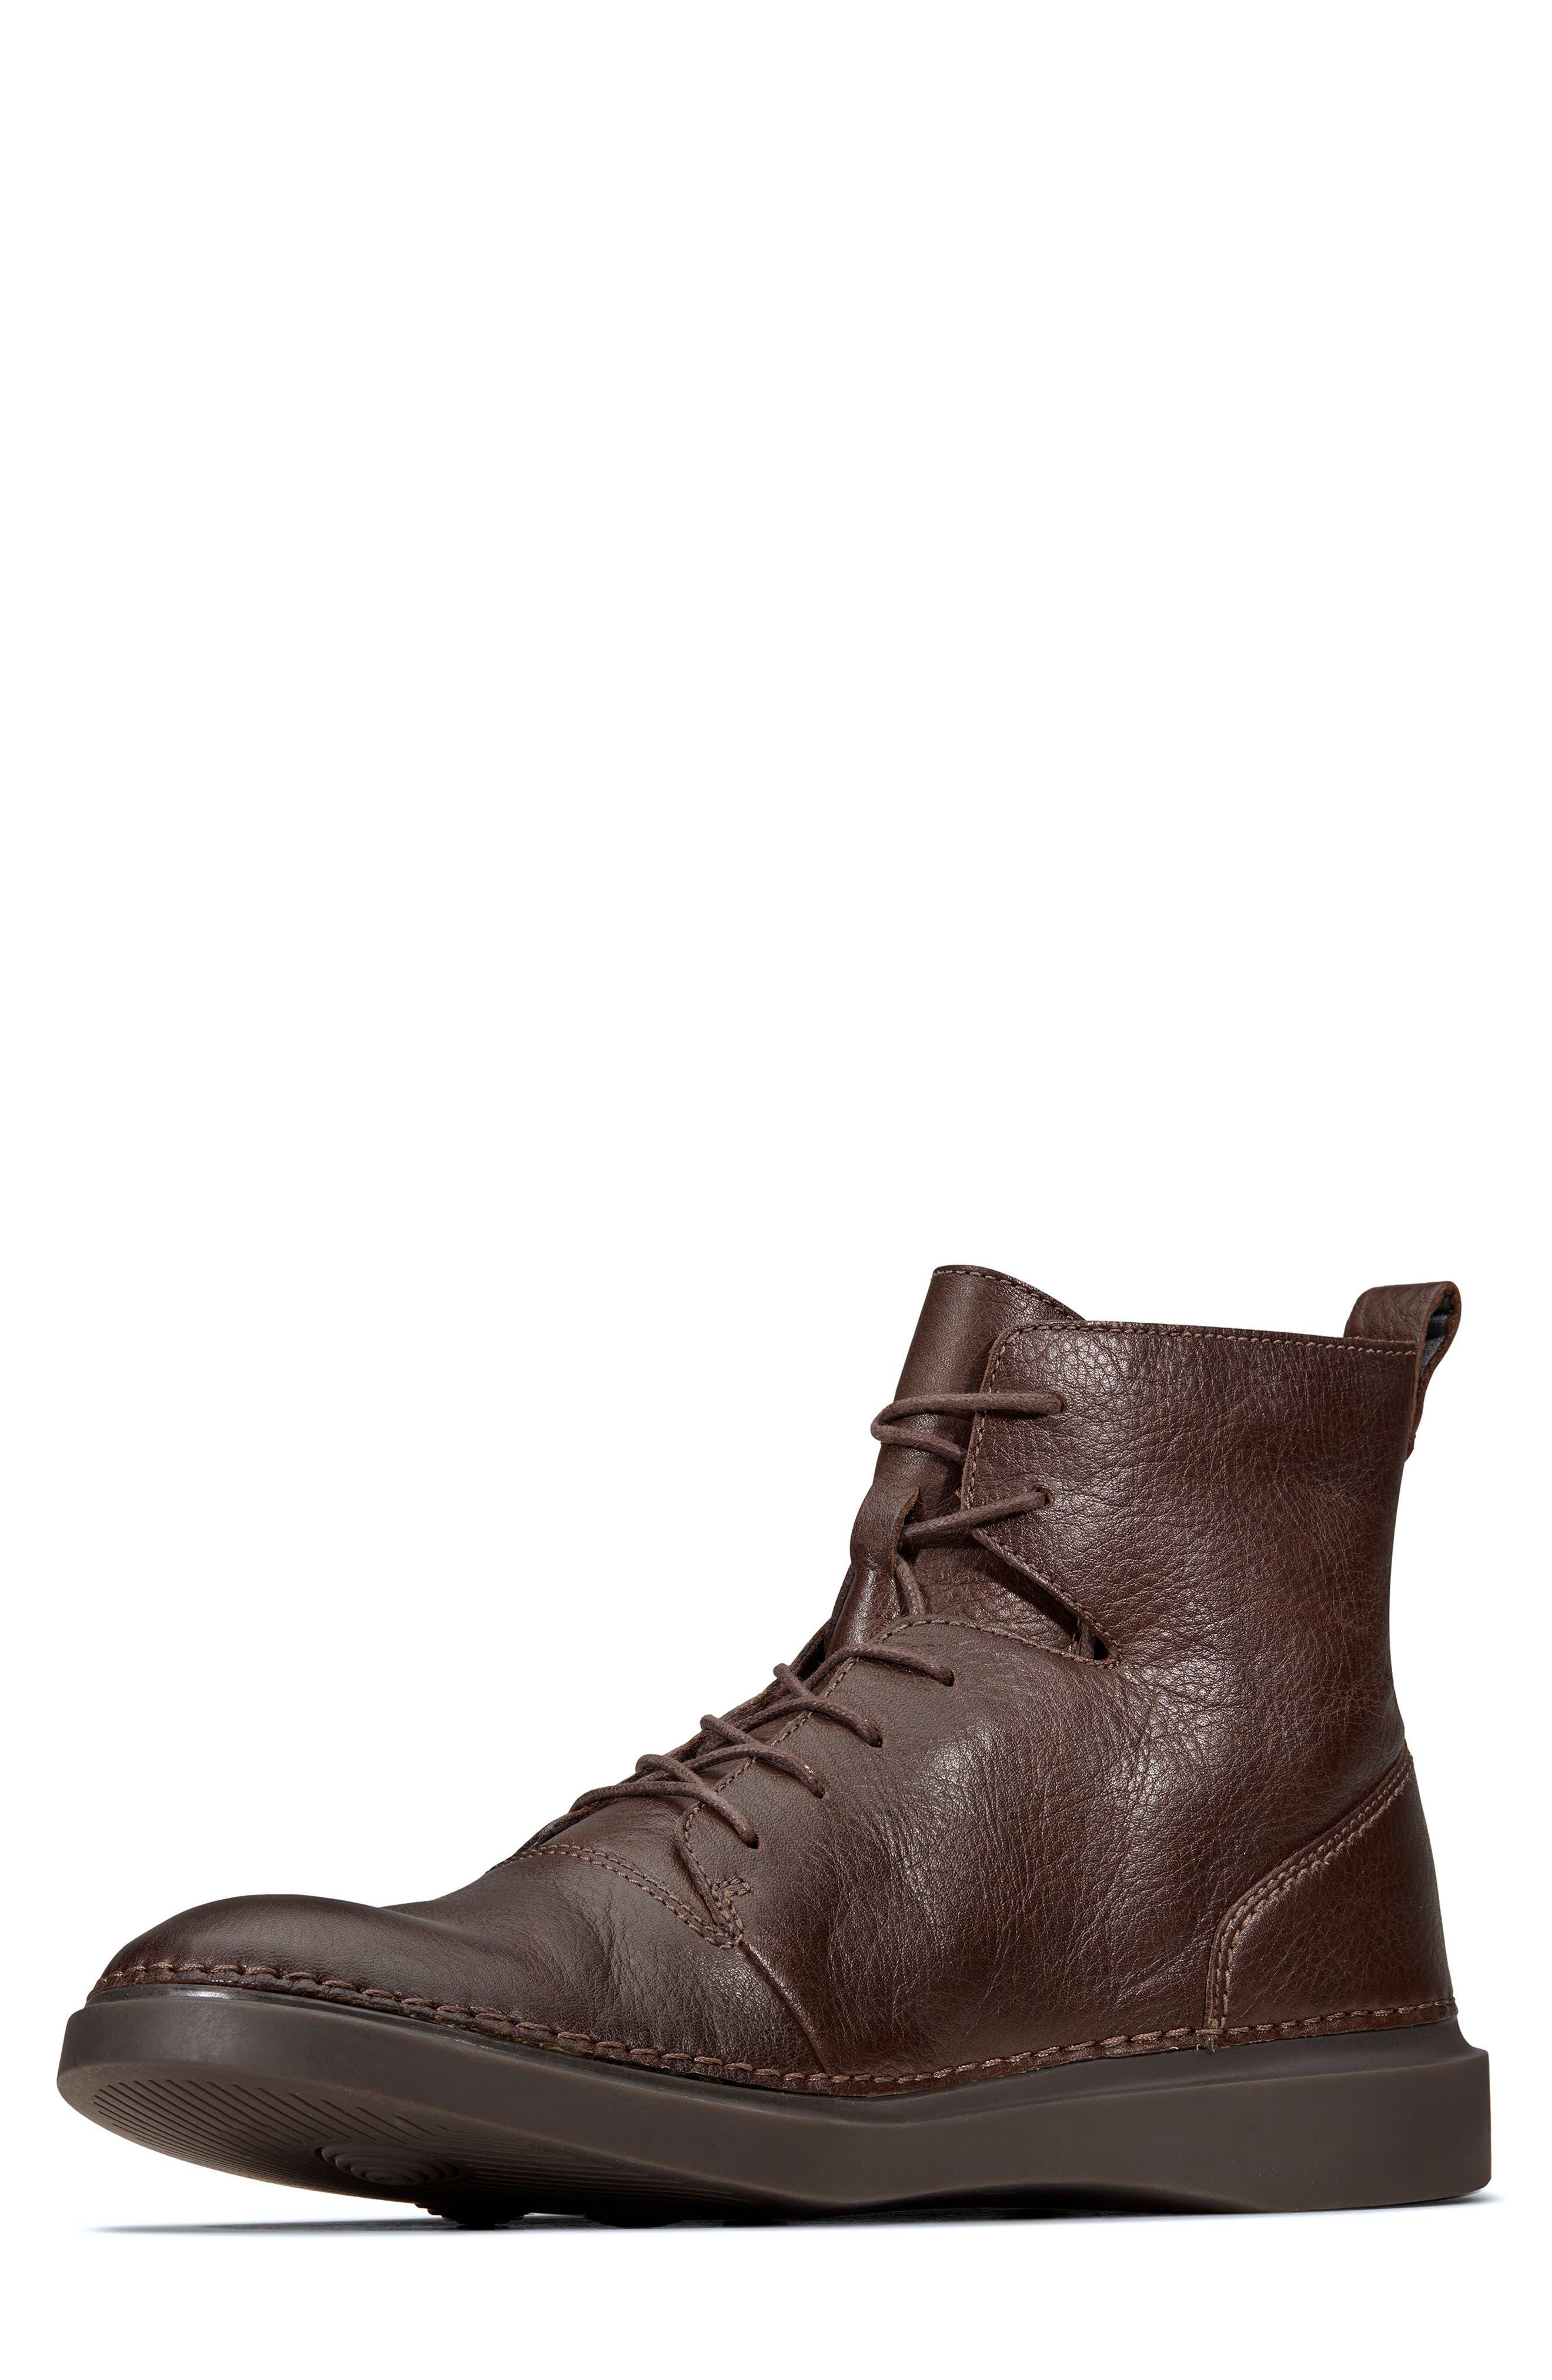 Hale Rise Plain Toe Boot,                             Alternate thumbnail 6, color,                             213